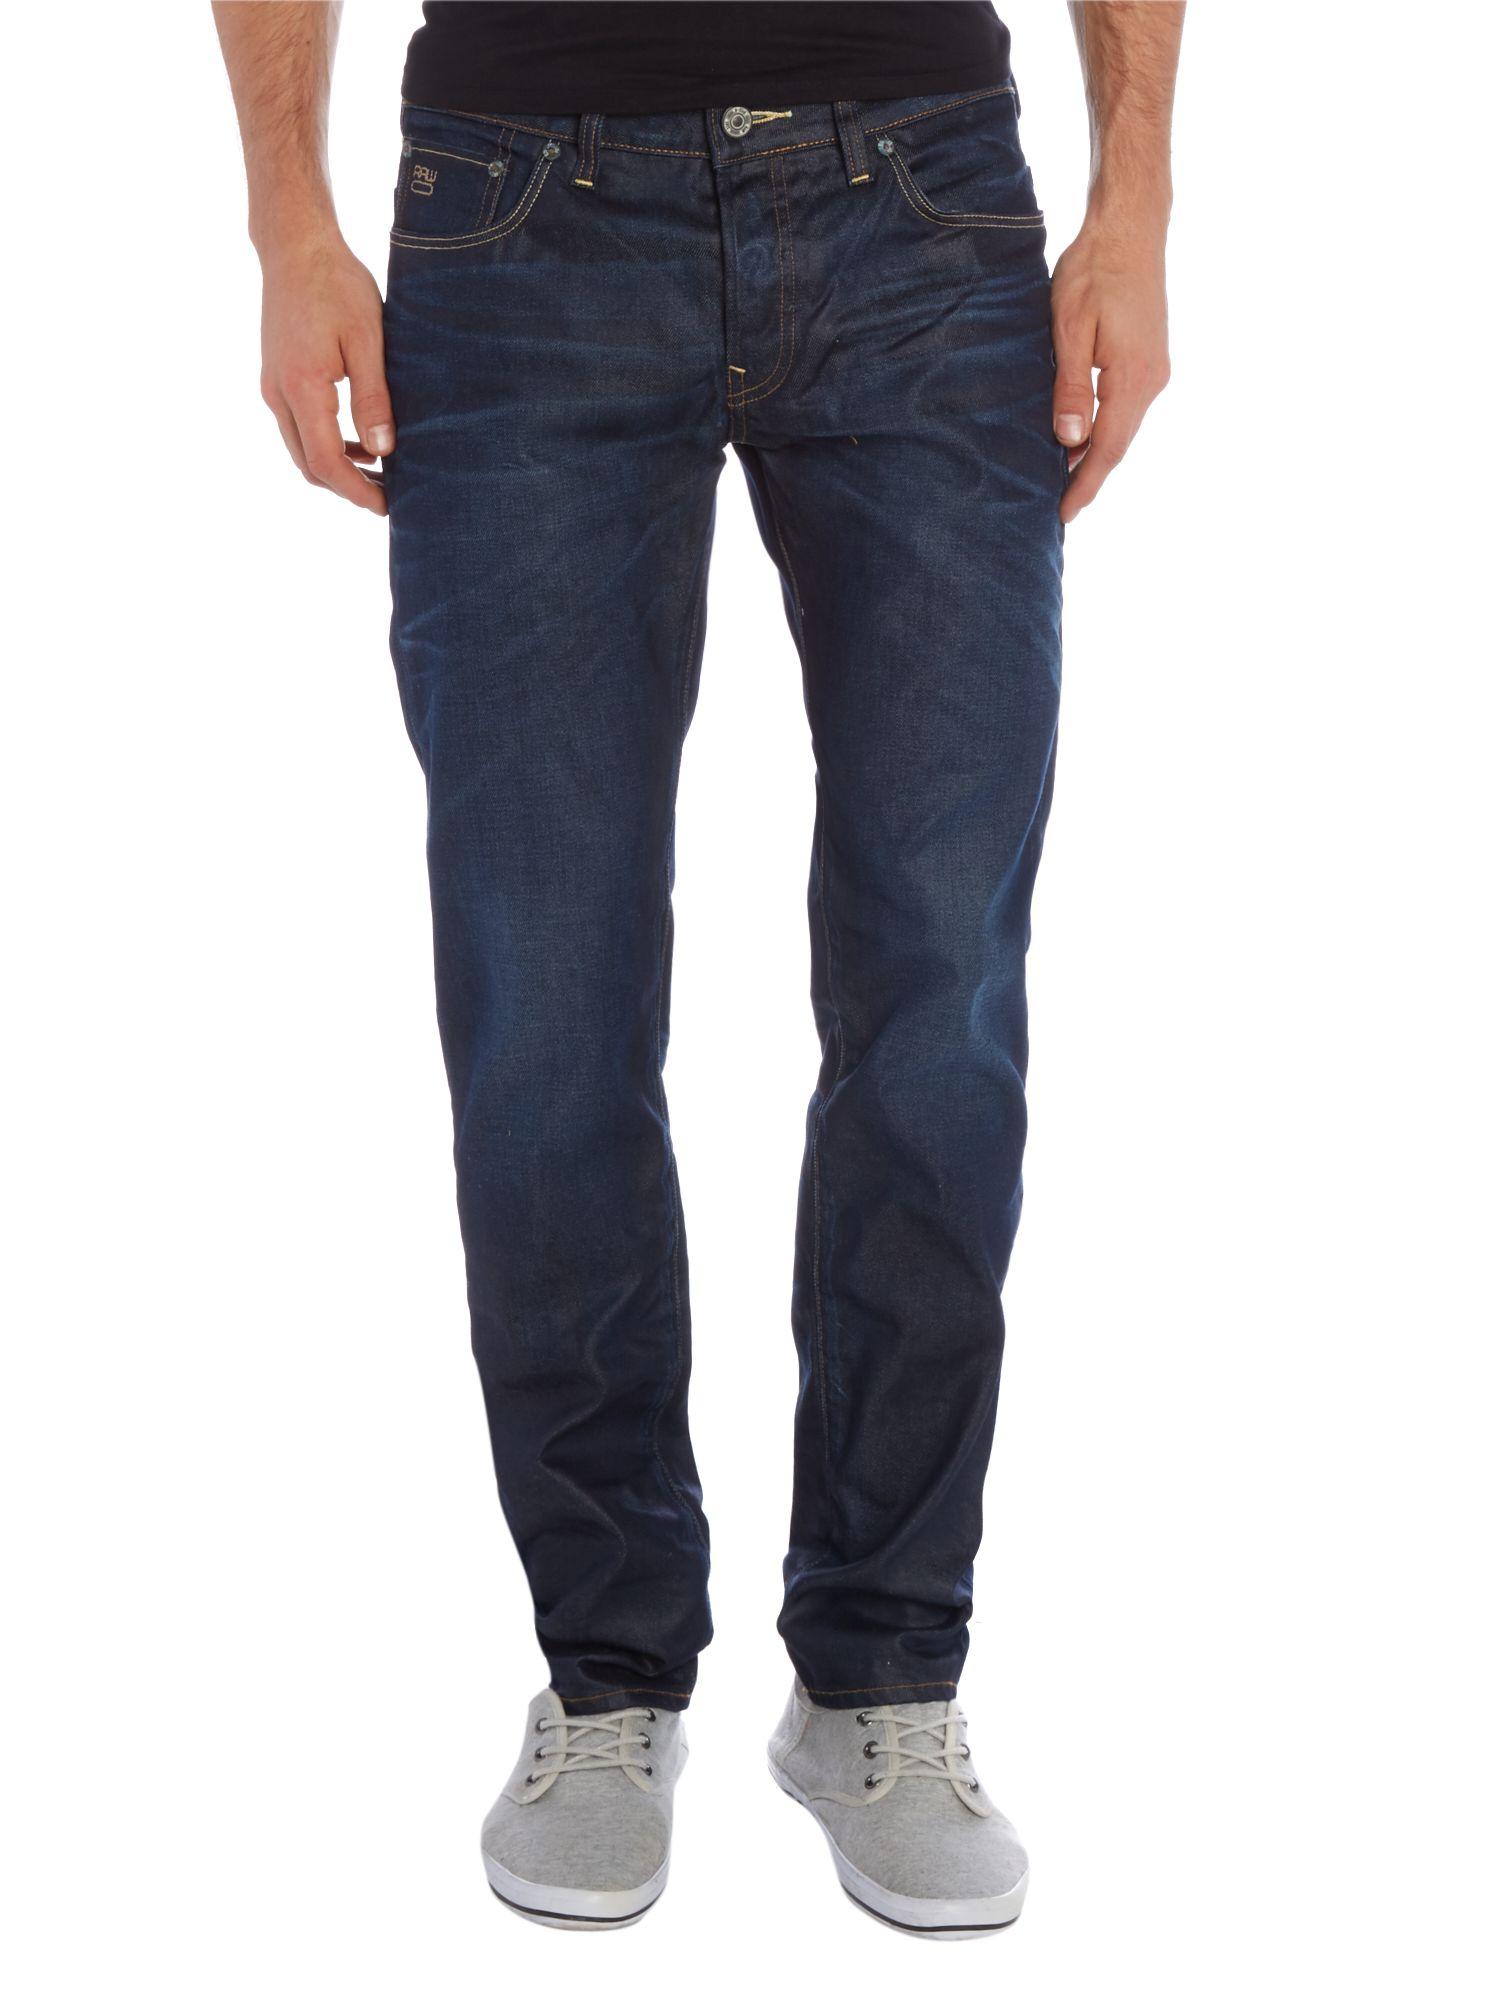 g star raw low tapered dark aged denim jeans in blue for men lyst. Black Bedroom Furniture Sets. Home Design Ideas